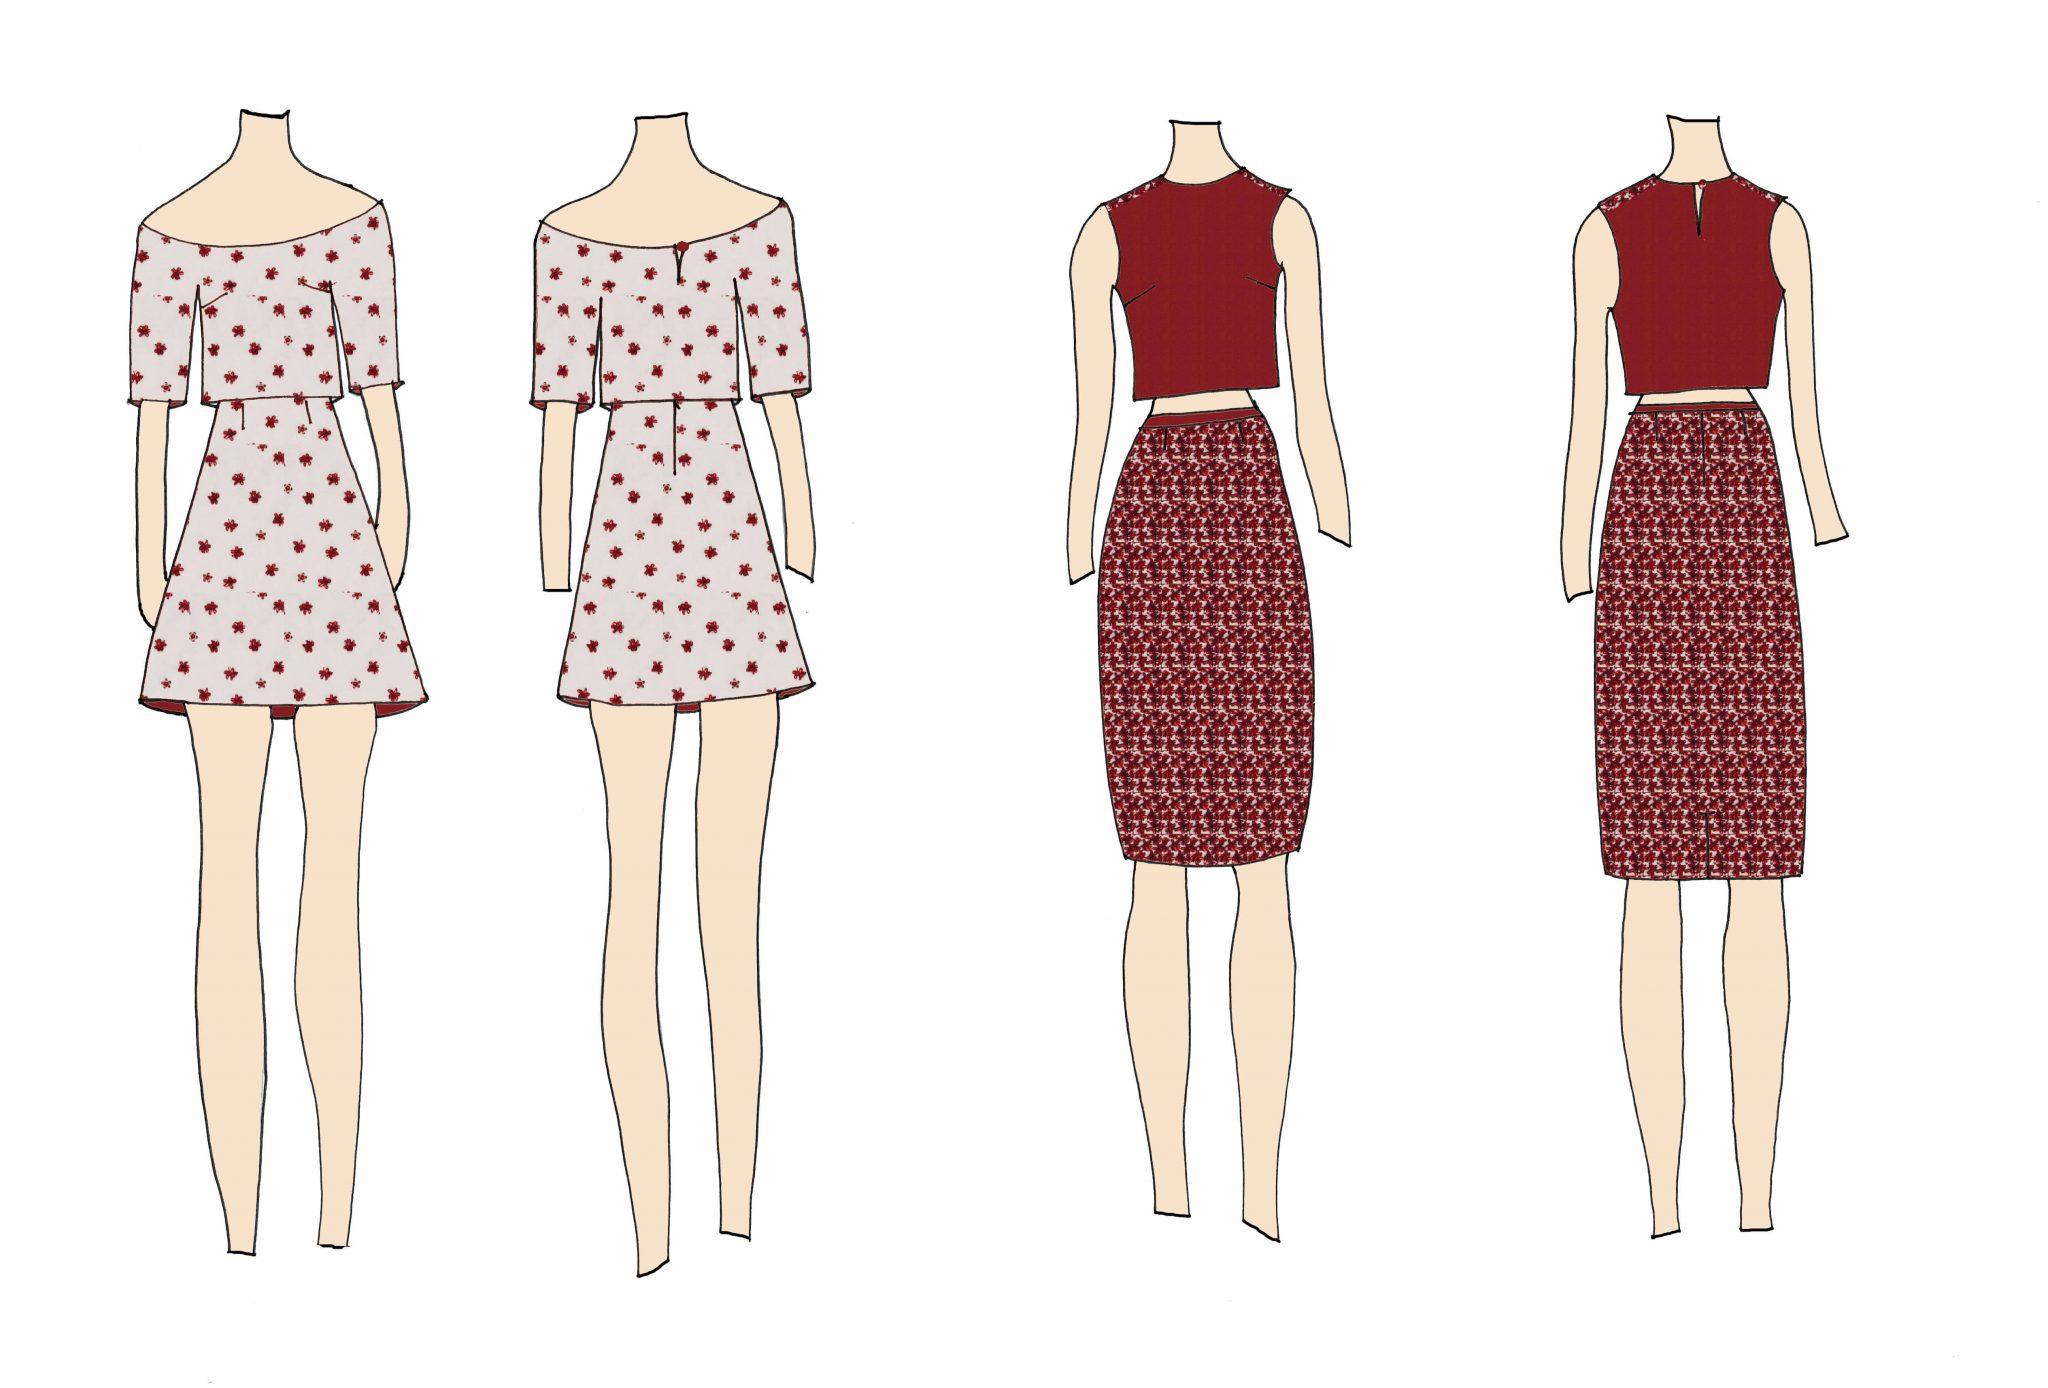 thepetitecat-dresses-design